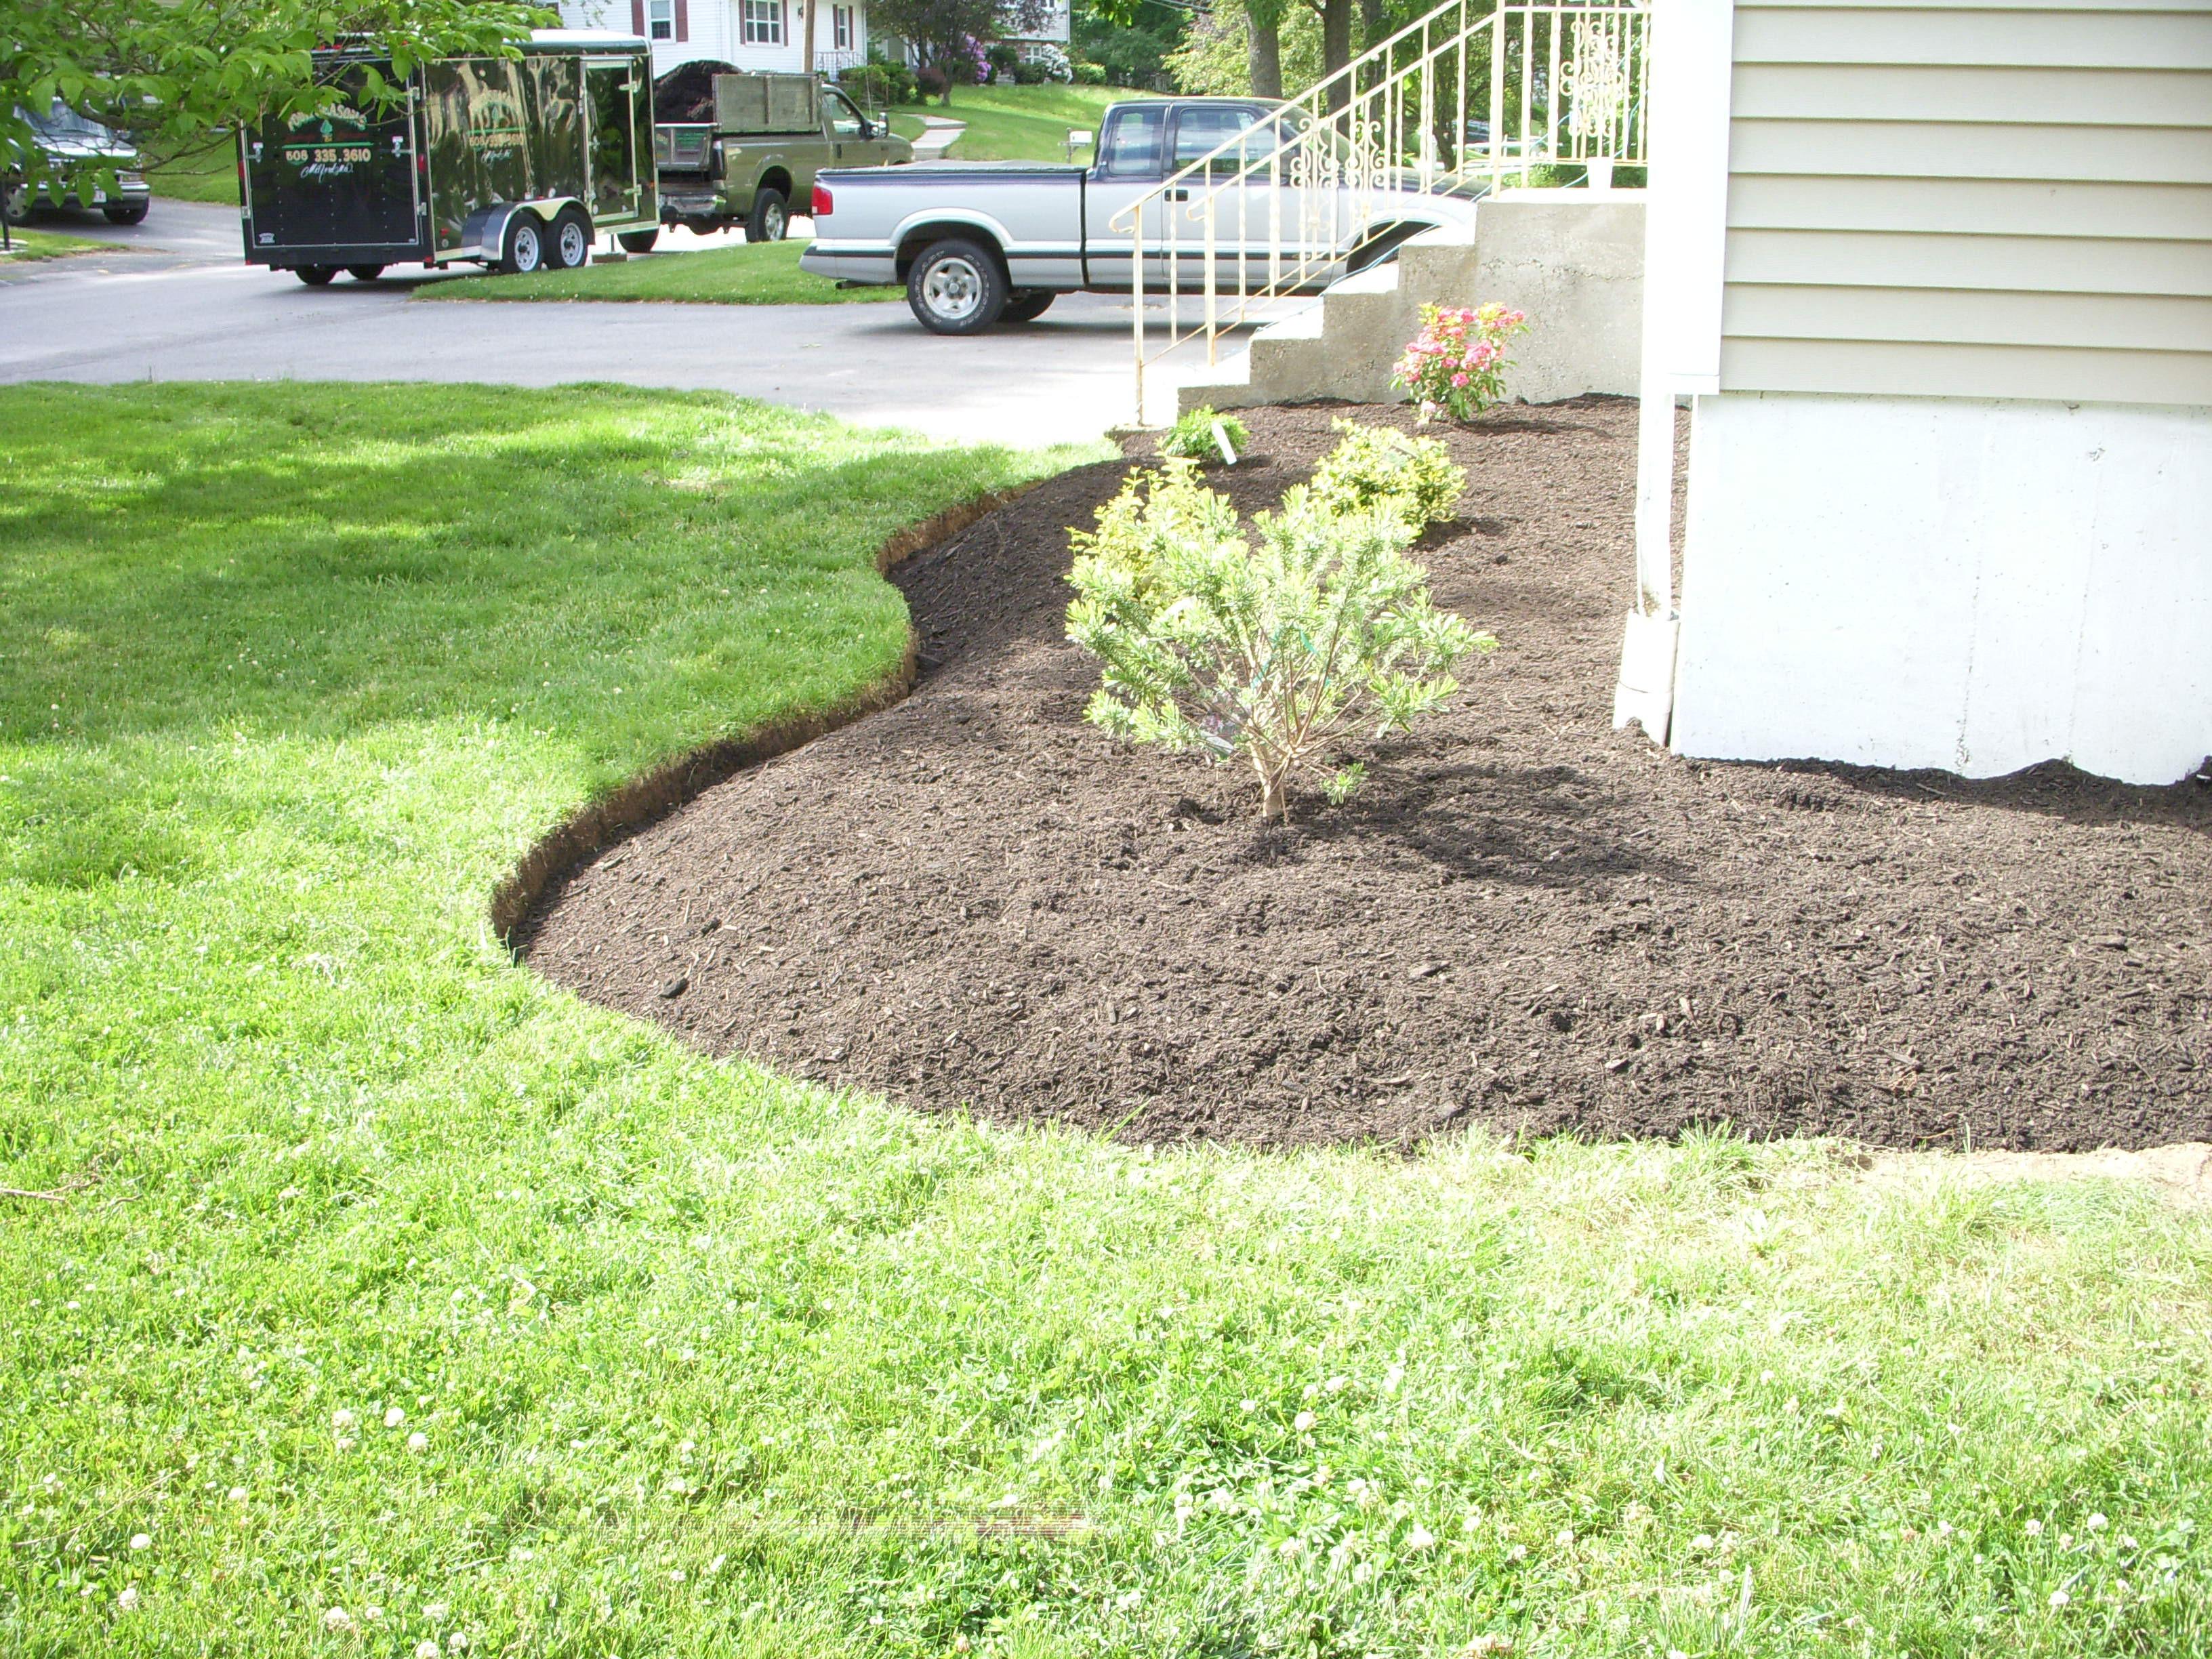 Best ideas about Home Depot Landscape Edging . Save or Pin Decor Cheap Landscape Border Now.